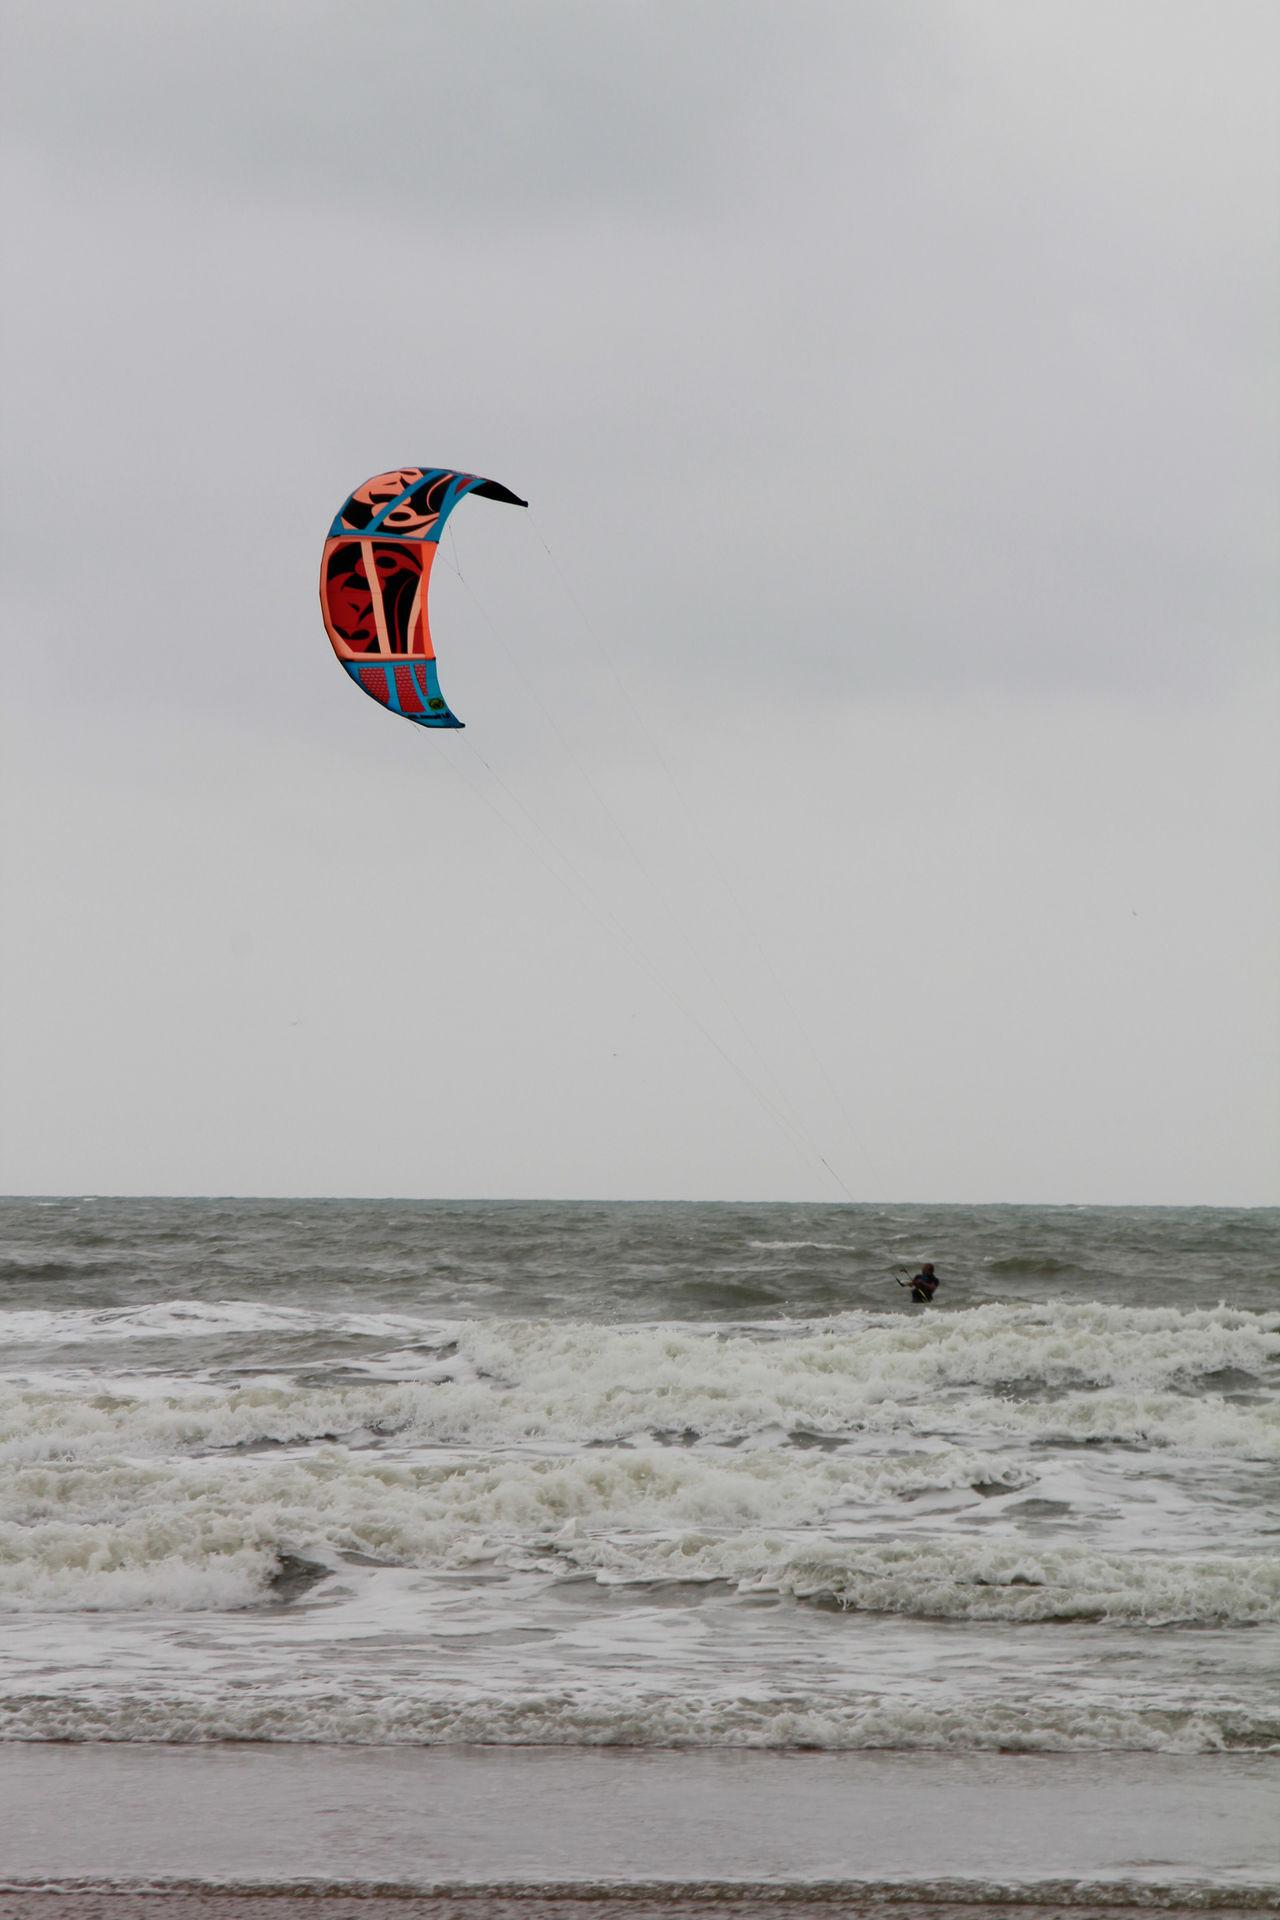 Adult Adventure Beach Extreme Sports Horizon Over Water Kite Kitesurfing Outdoors Sea Sport Water Watersports